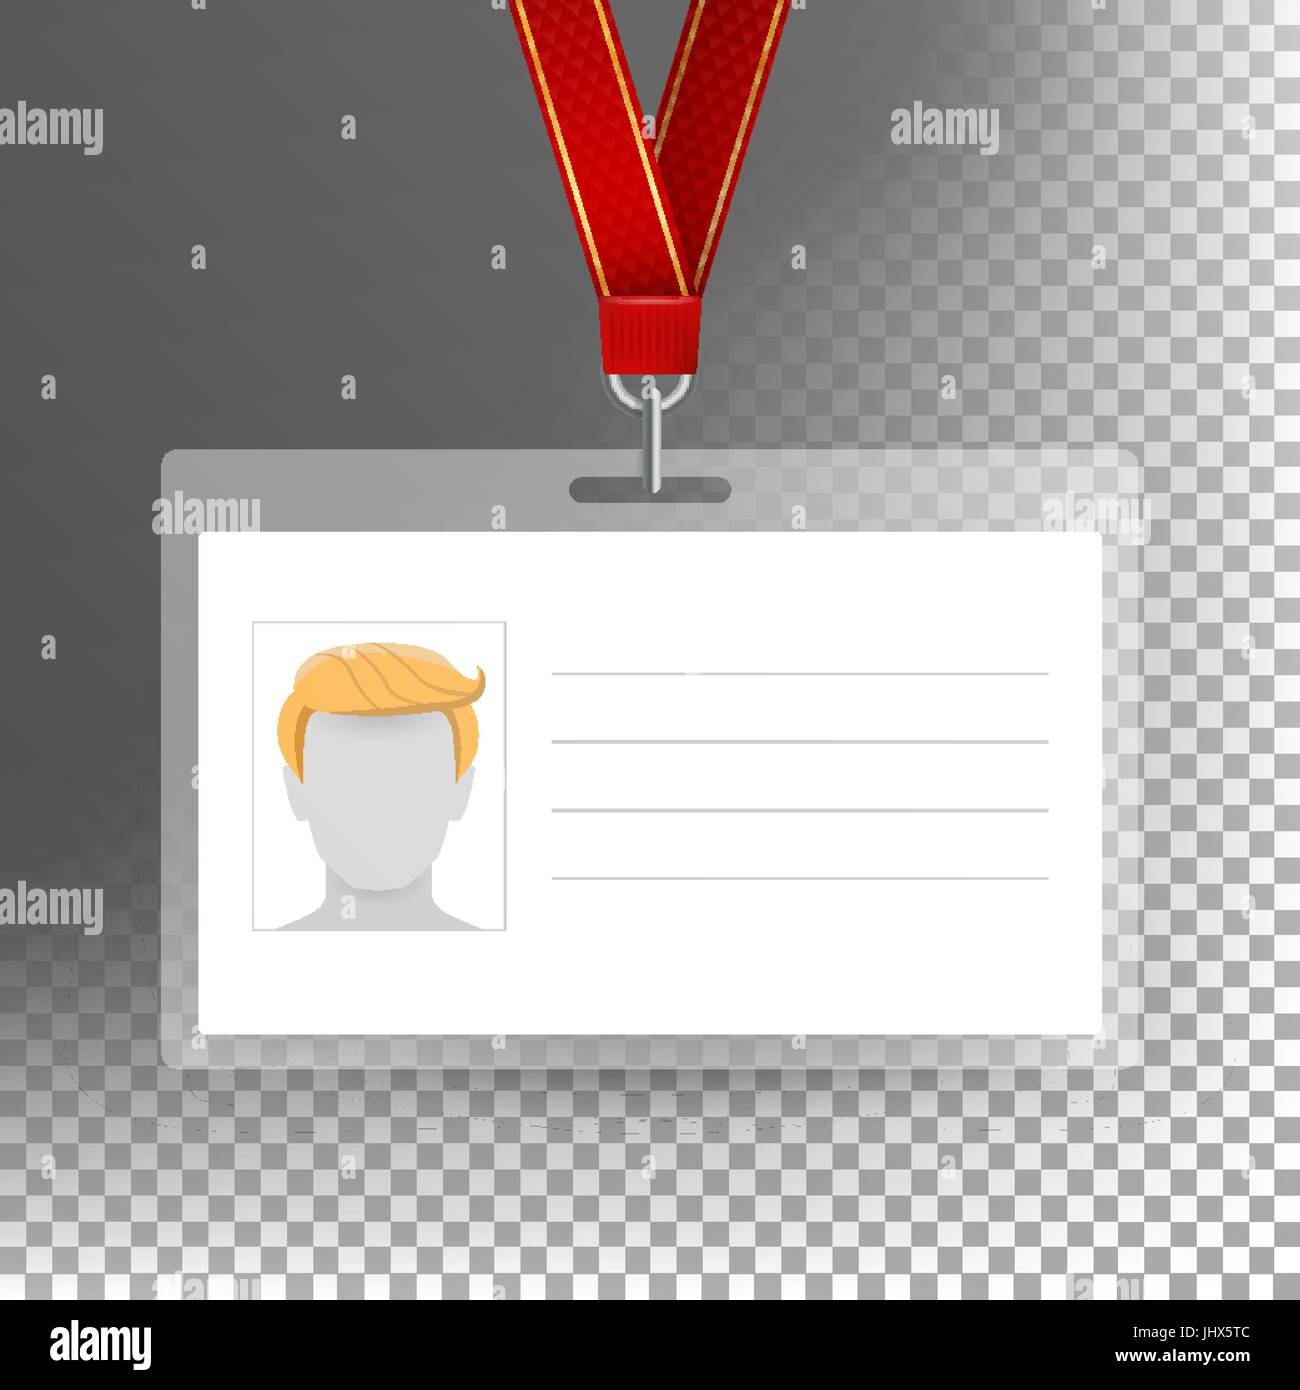 Personal Id Card Imágenes De Stock & Personal Id Card Fotos De Stock ...